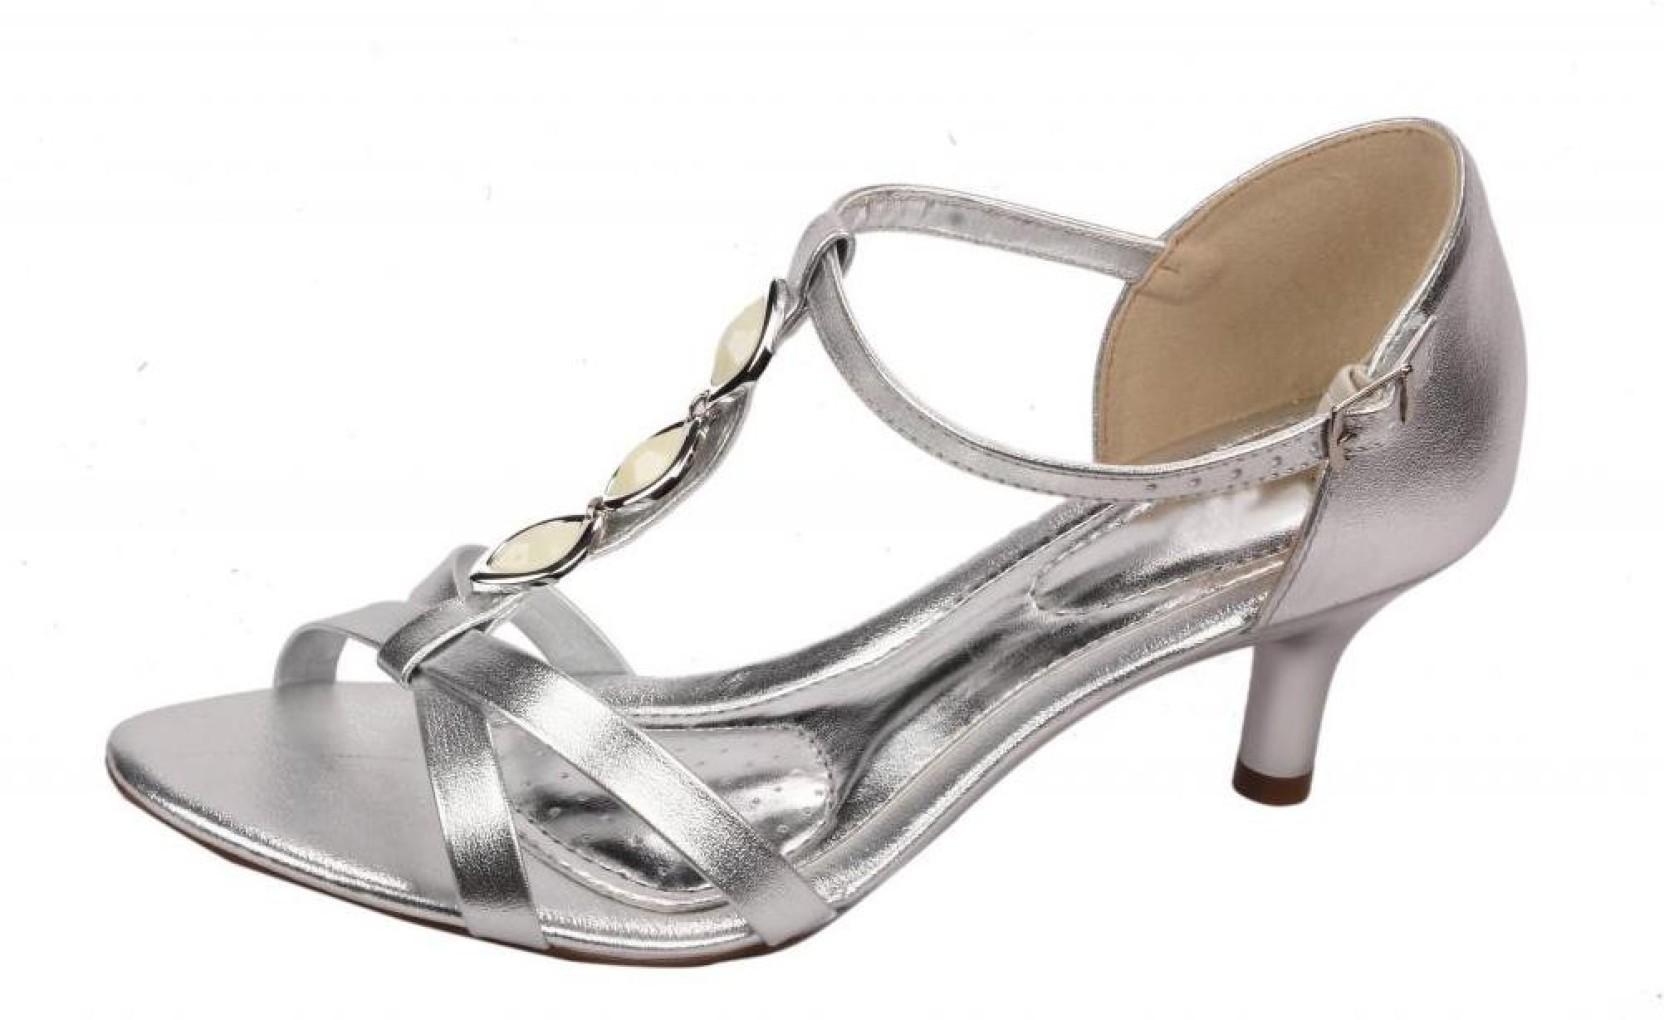 784cc802acd Moda Brasil Women SILVER Heels - Buy SILVER Color Moda Brasil Women ...